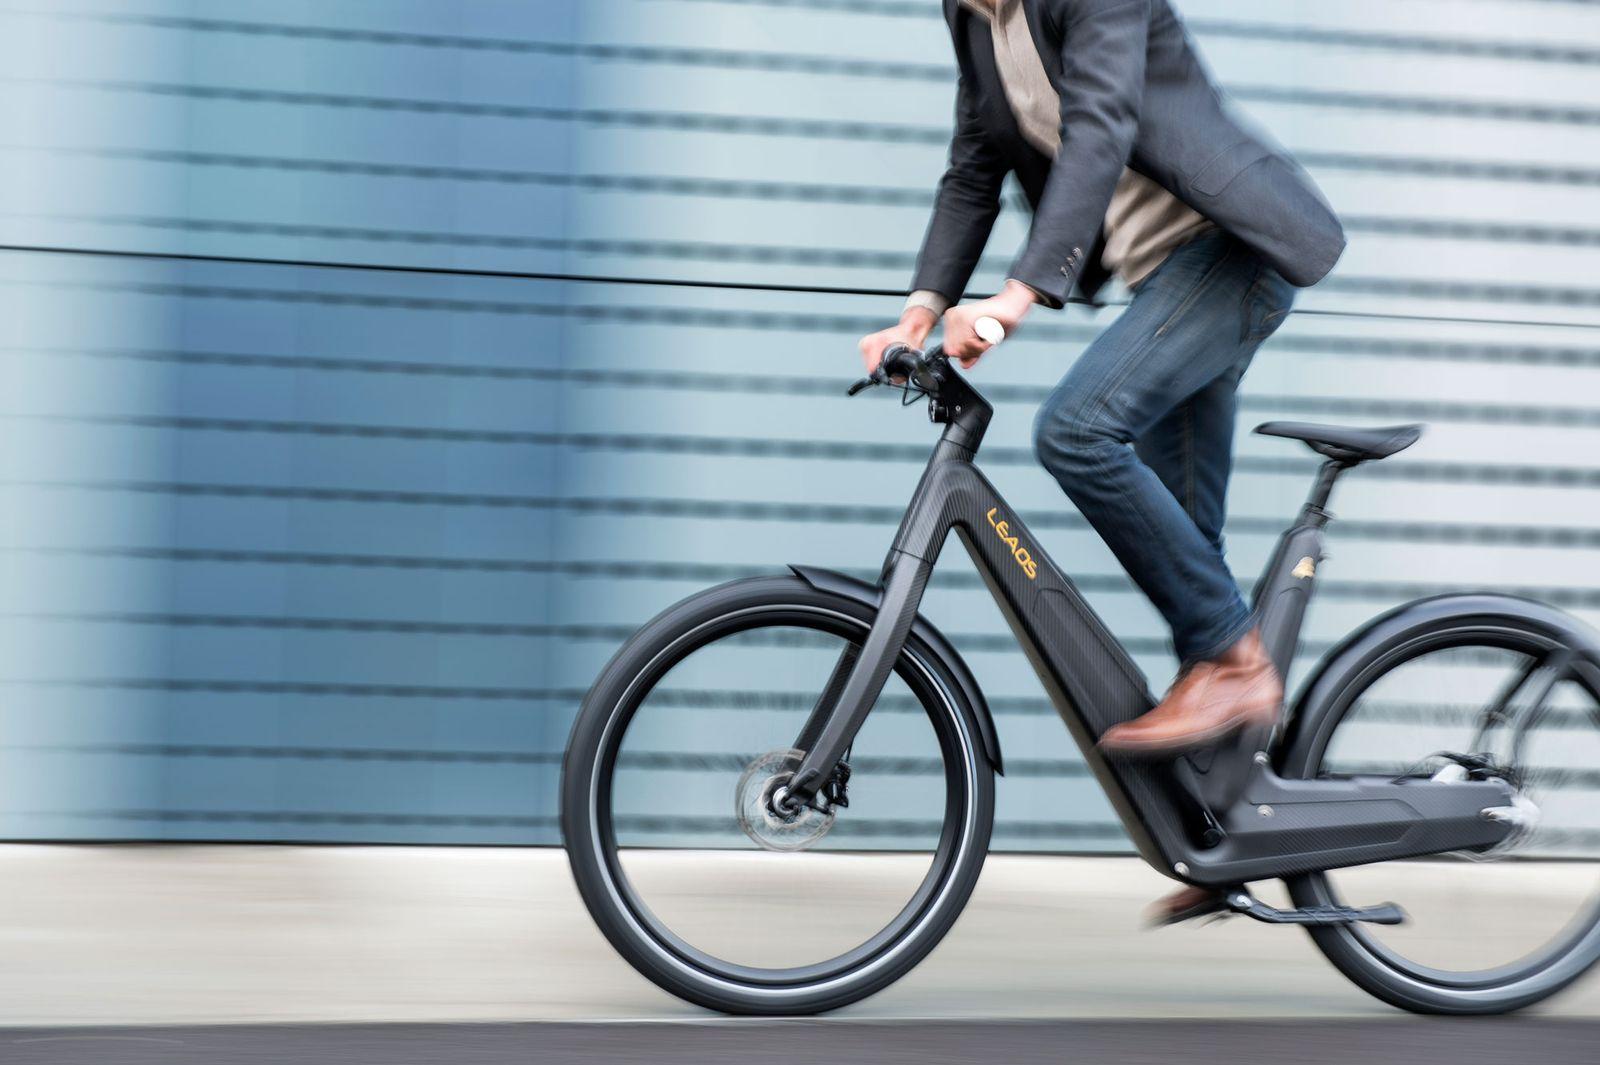 EINMALIGE VERWENDUNG neuerdings/ City Bike Leaos